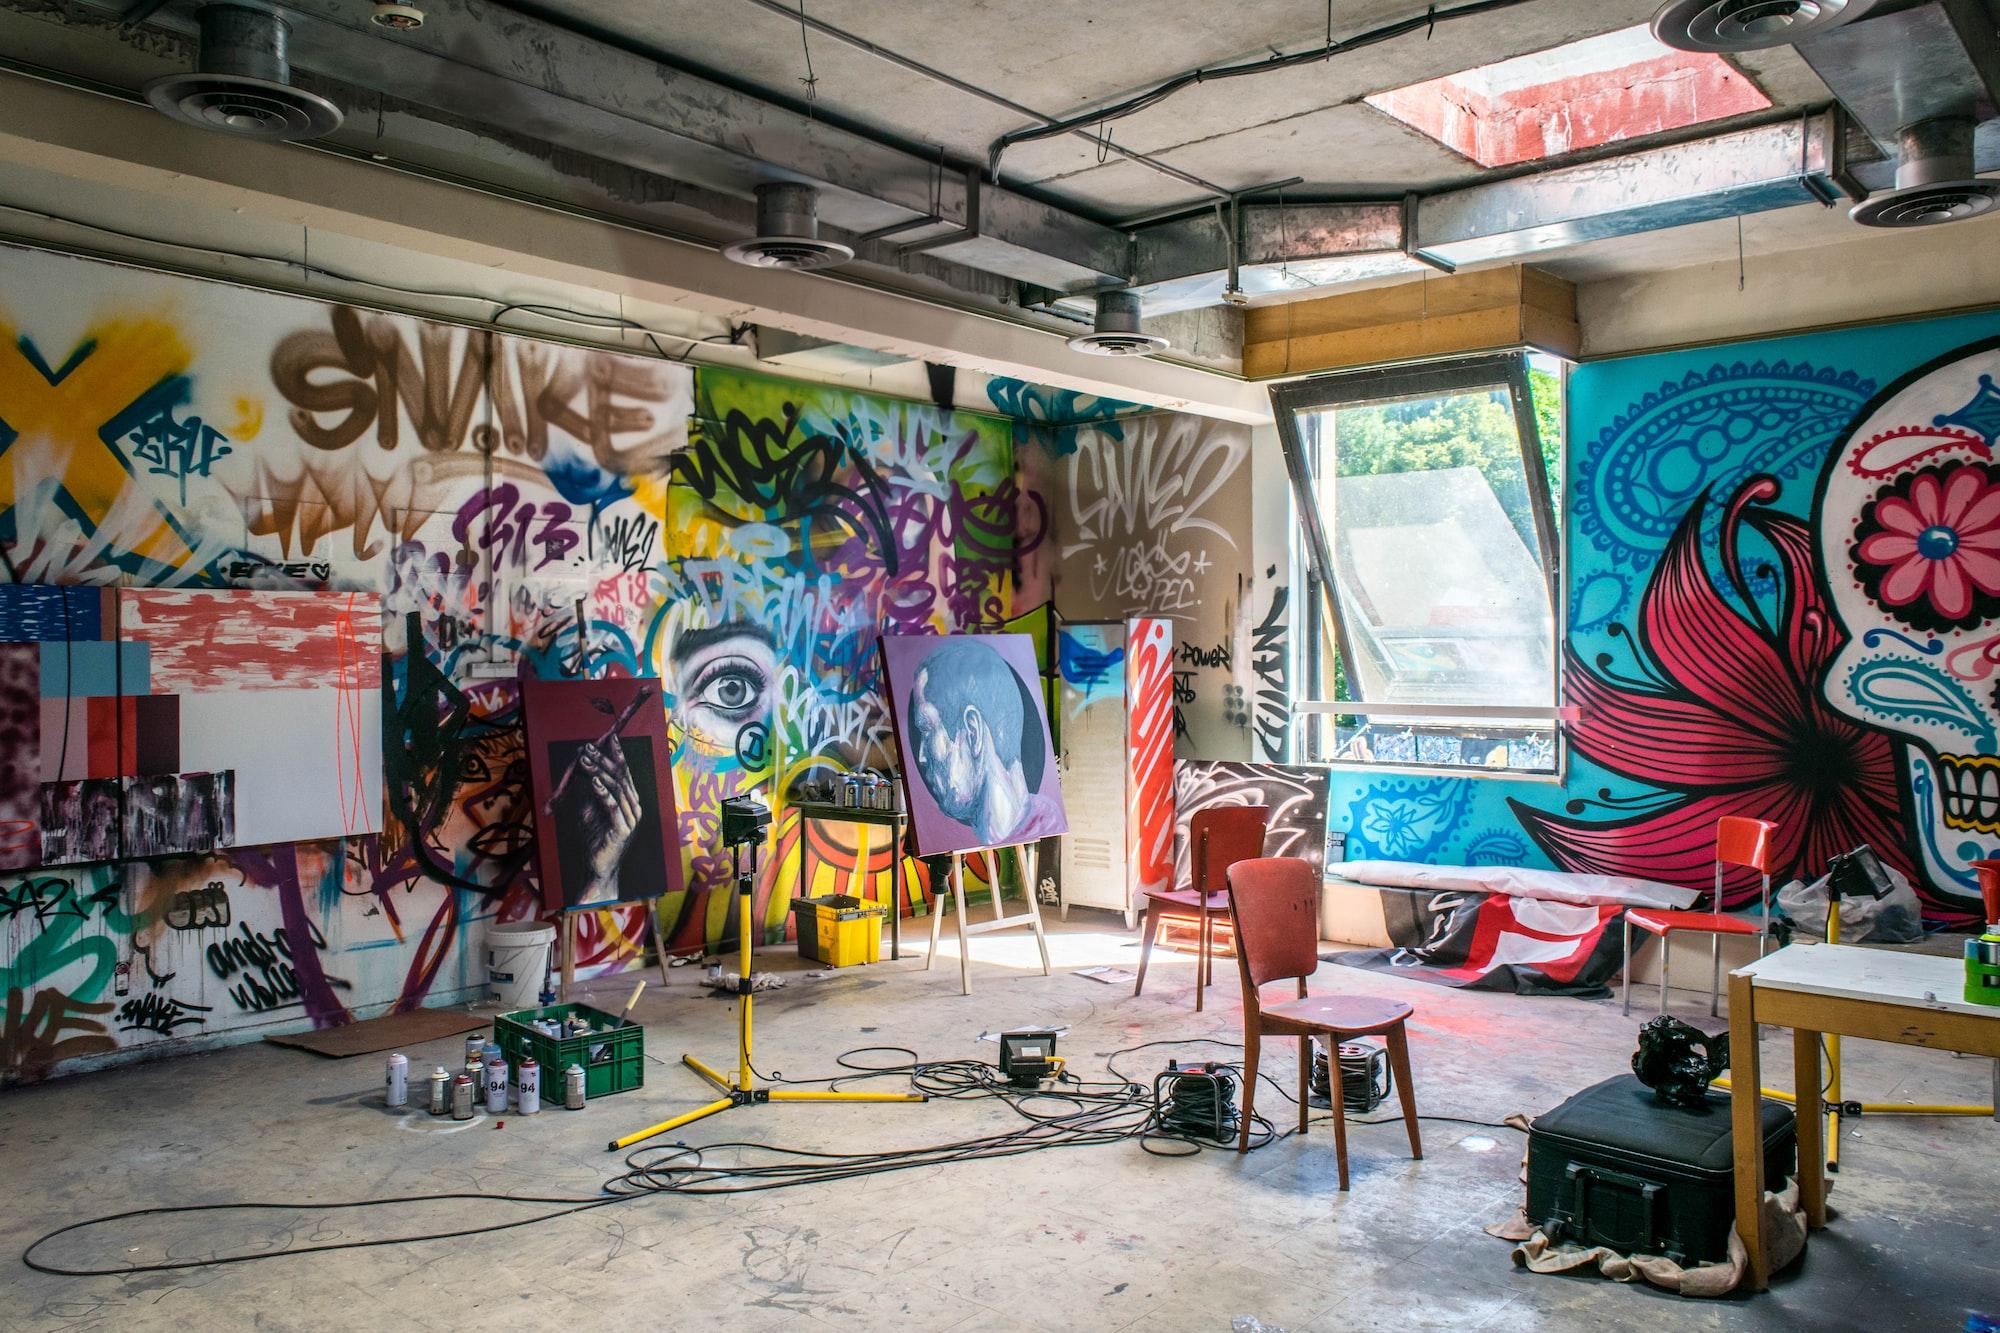 Art studio with wall graffiti